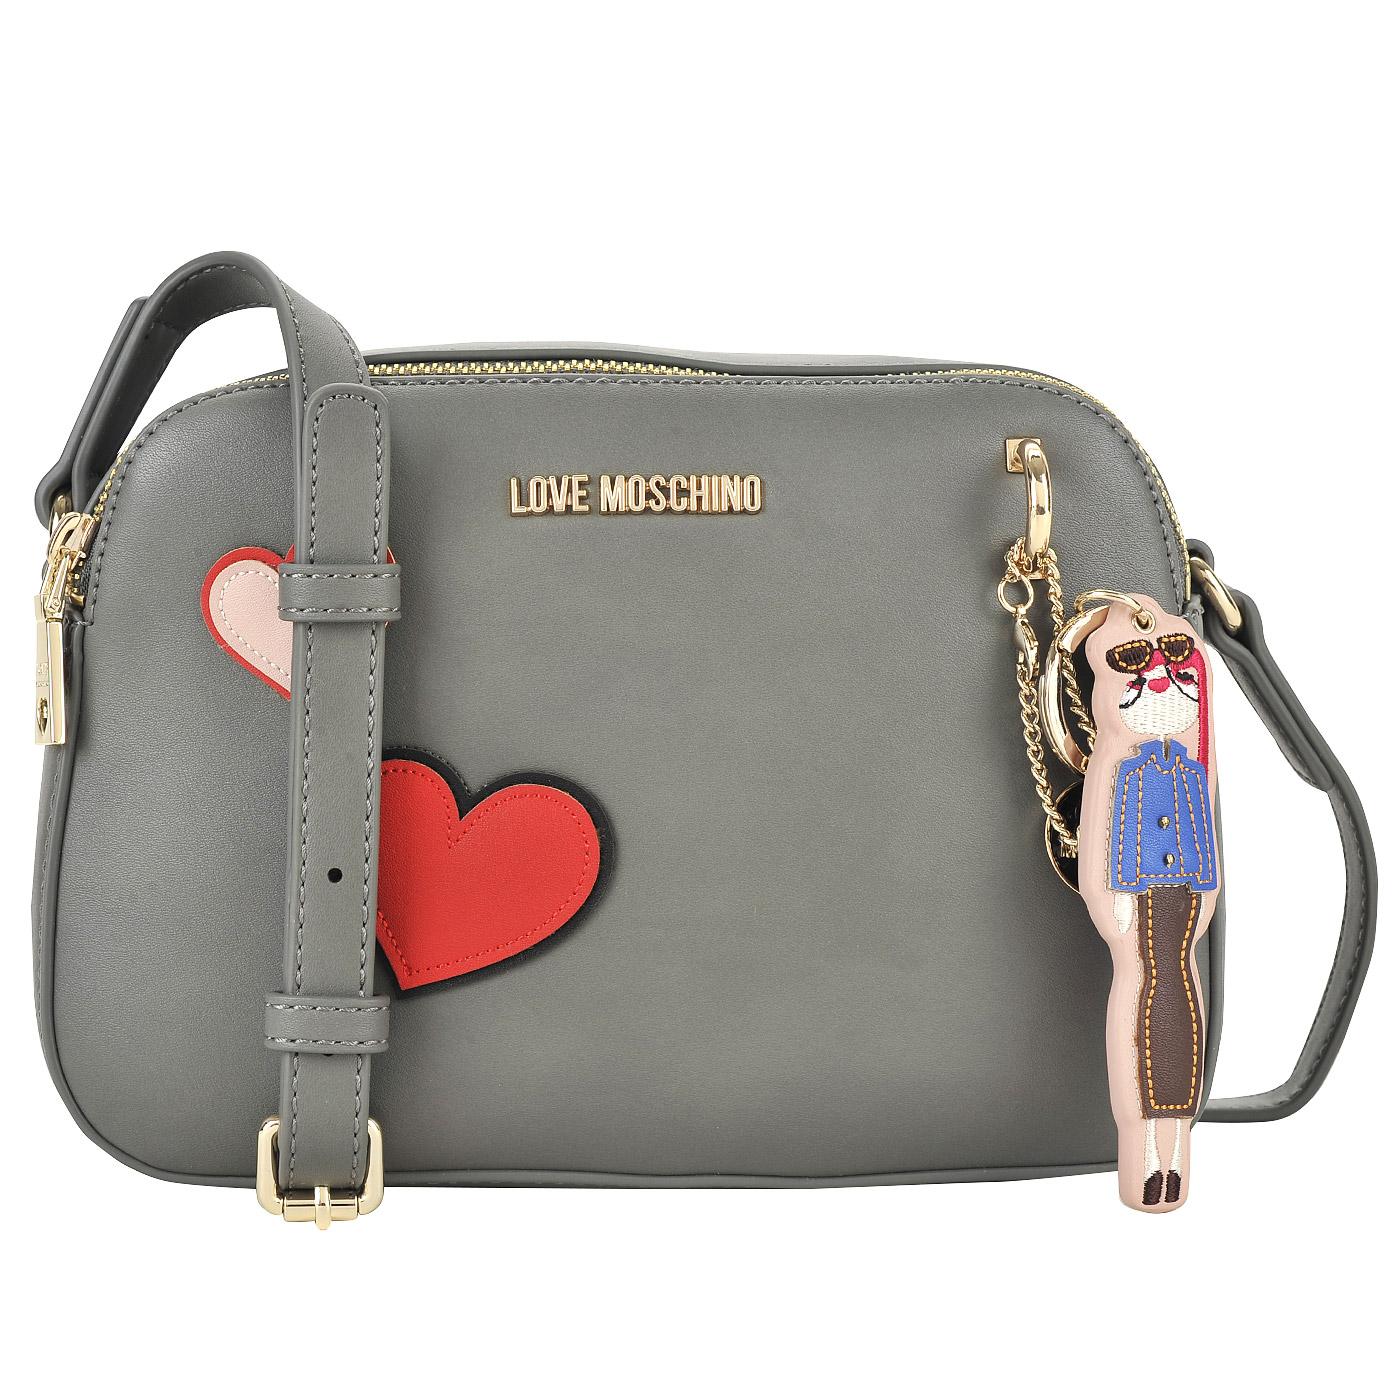 f38c5a67a61c Серая сумка кросс-боди с аппликацией и съемным брелоком Love Moschino Girls  and hearts ...